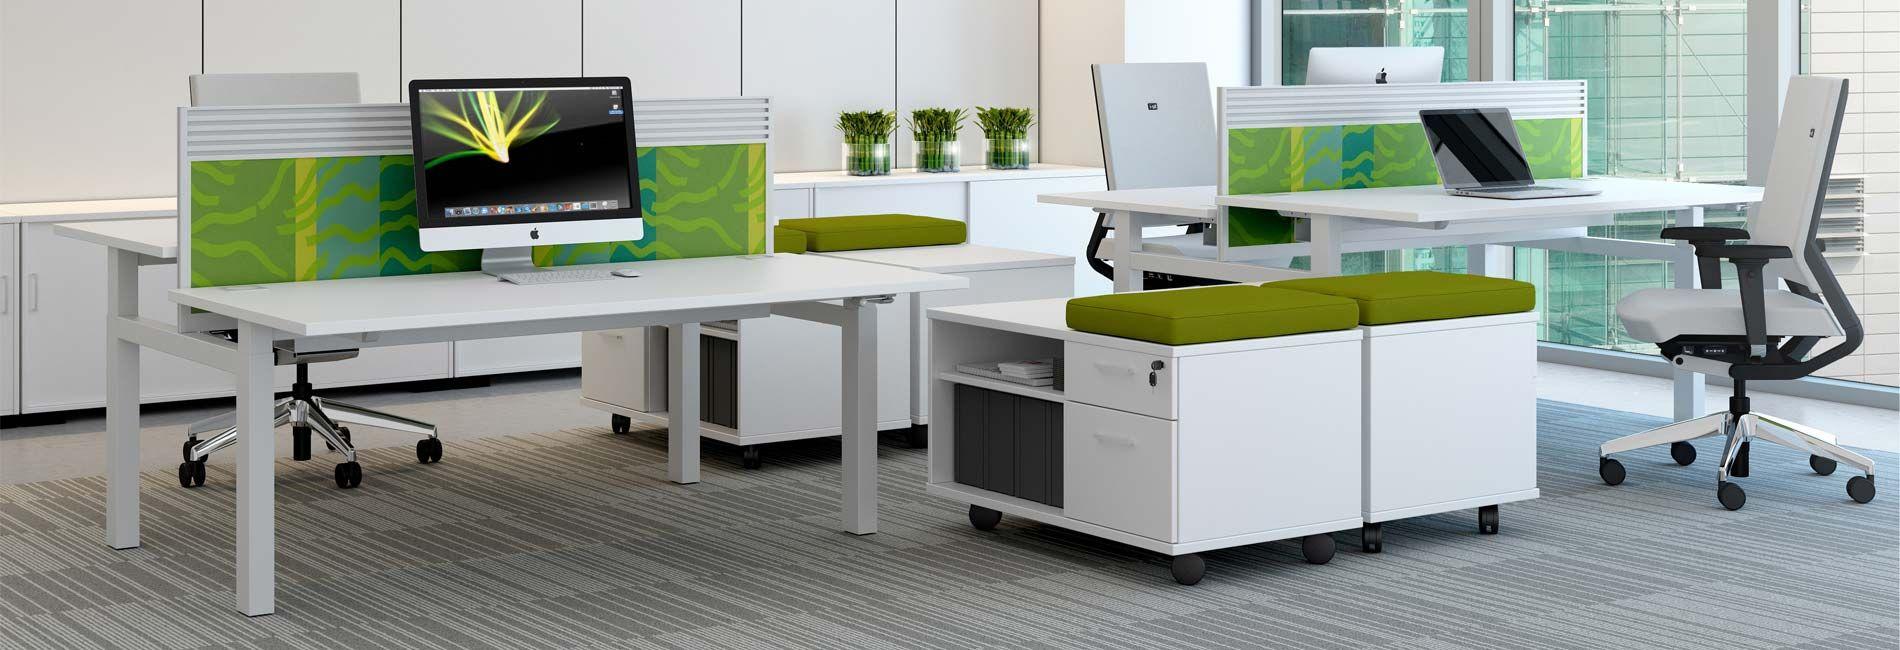 unusual office furniture. Office Furniture Unique Cool Ideas Unusual W